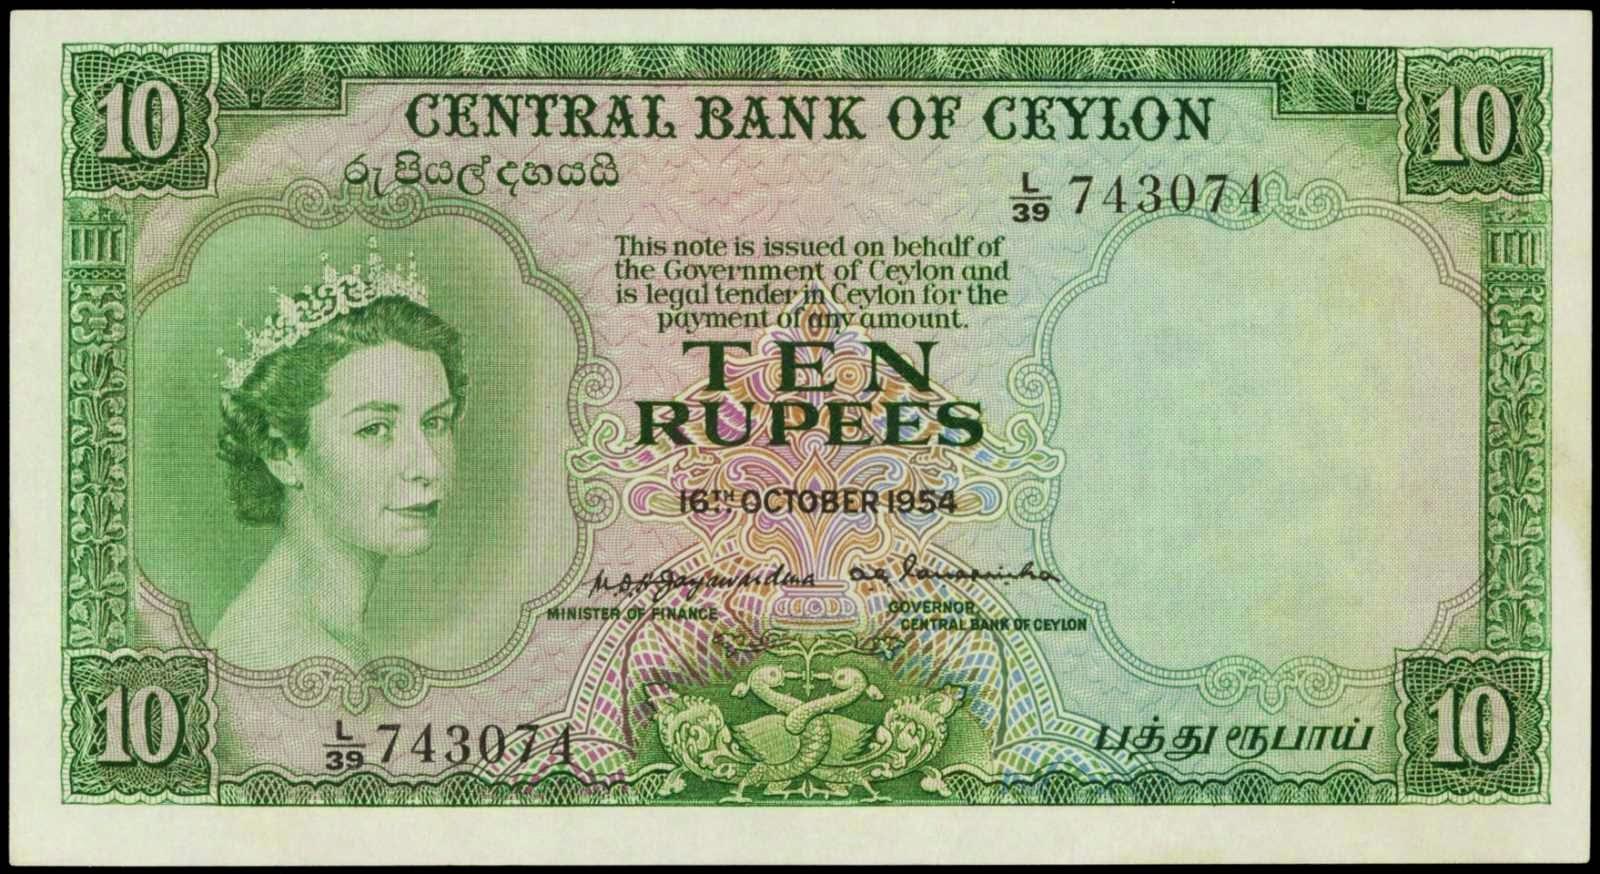 Ceylon banknotes Rs 10 Rupees bank note 1954 Queen Elizabeth II